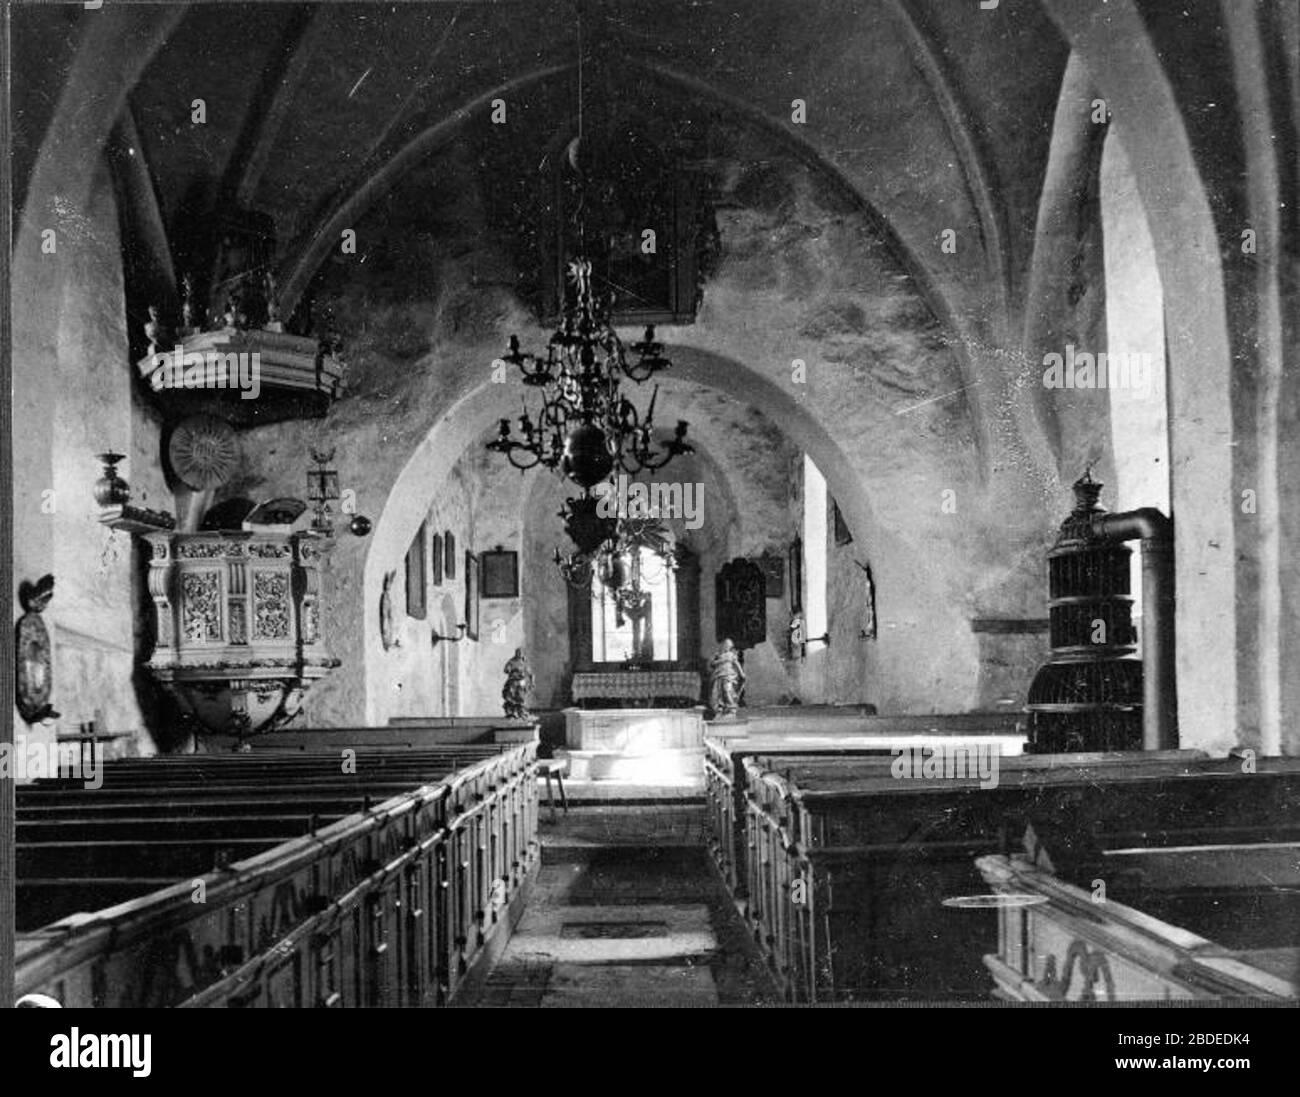 Husby - rlinghundra kyrka Unknown dateUnknown date